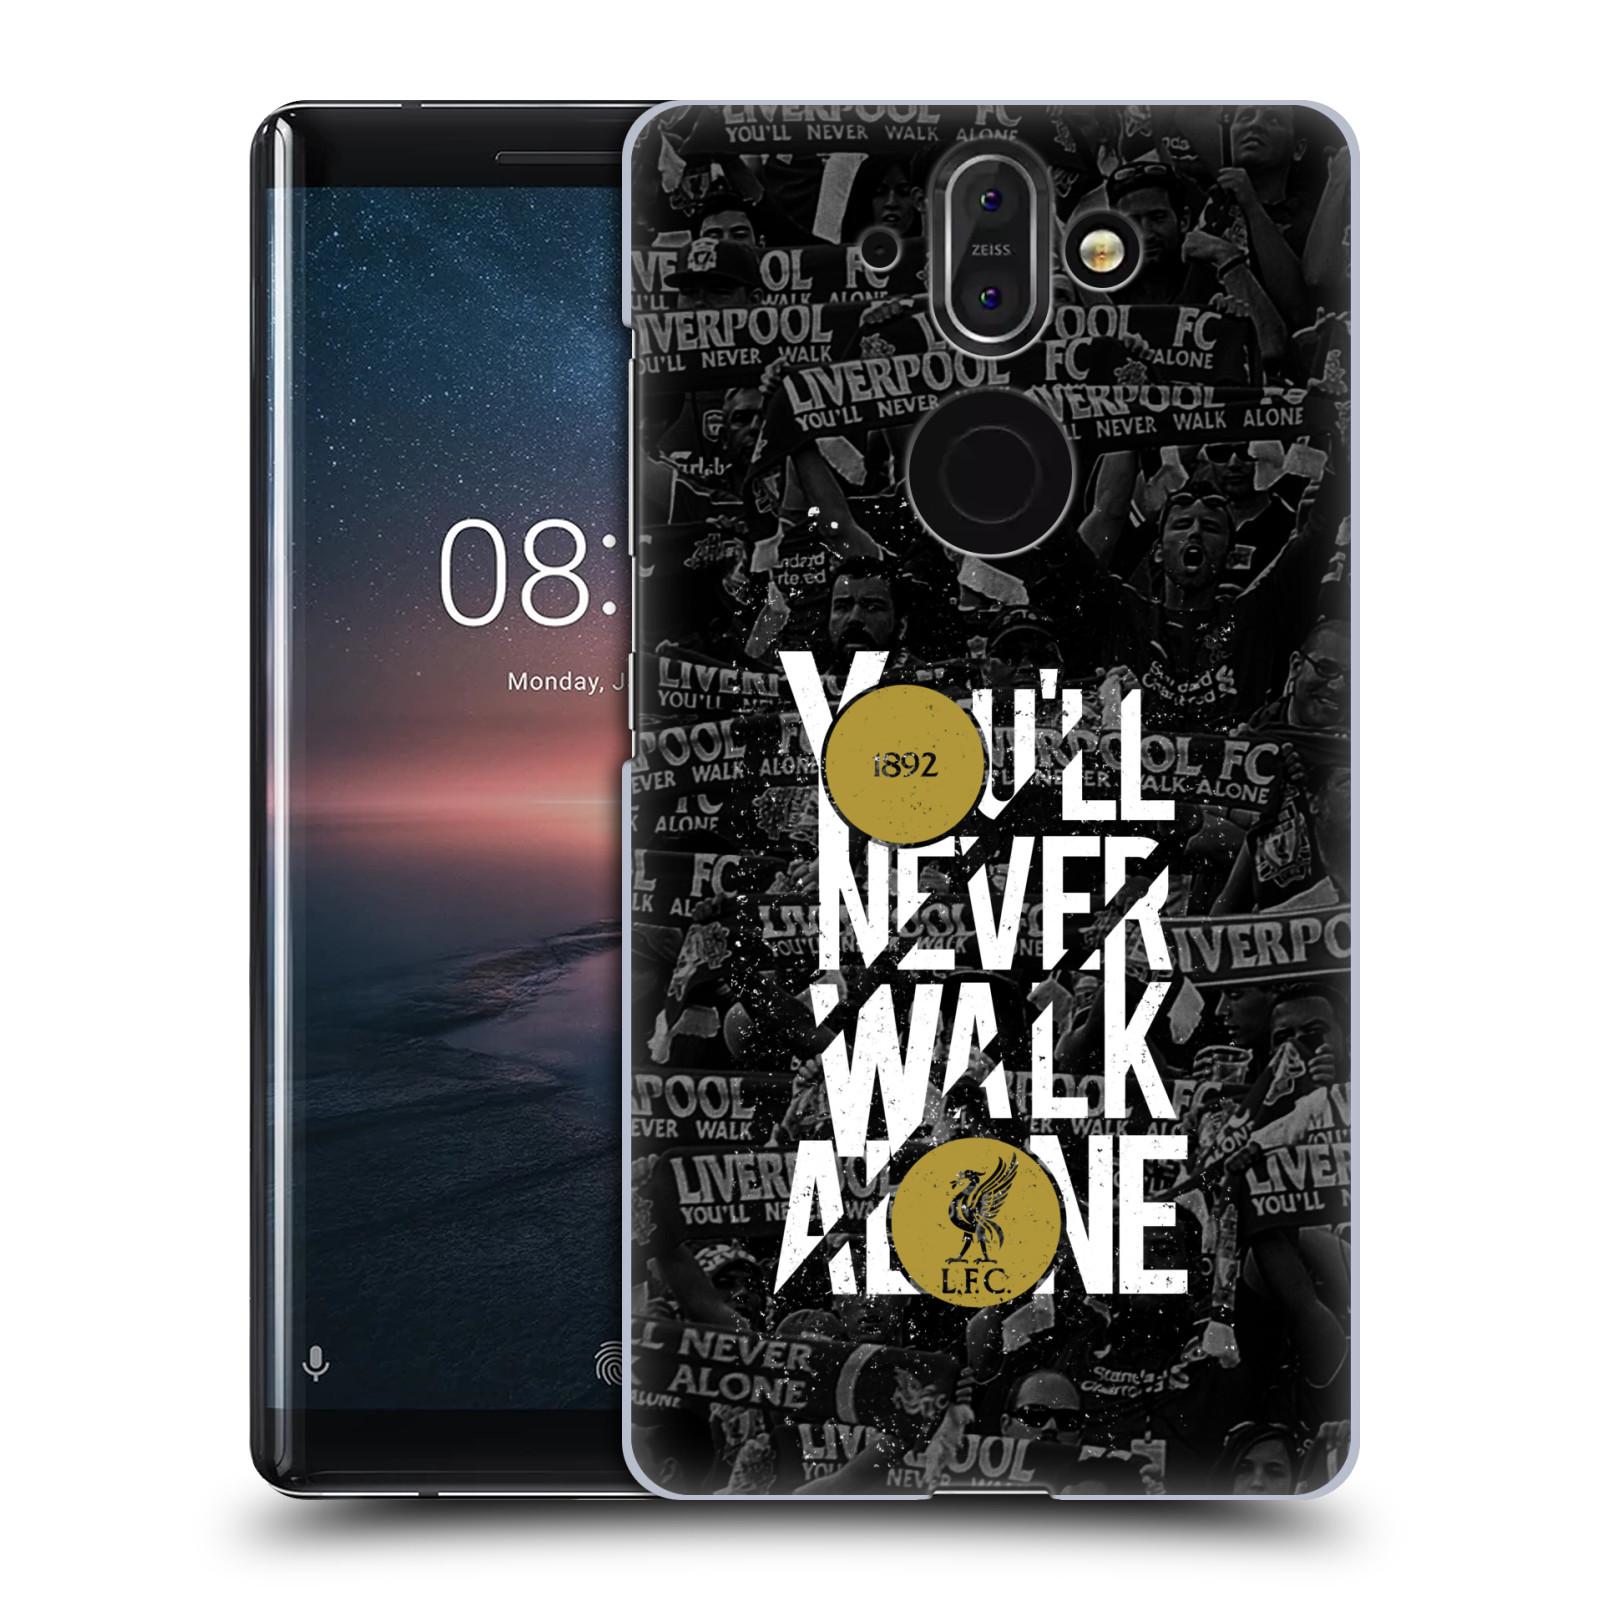 Plastové pouzdro na mobil Nokia 8 Sirocco - Head Case - 1892 LFC You'll Never Walk Alone